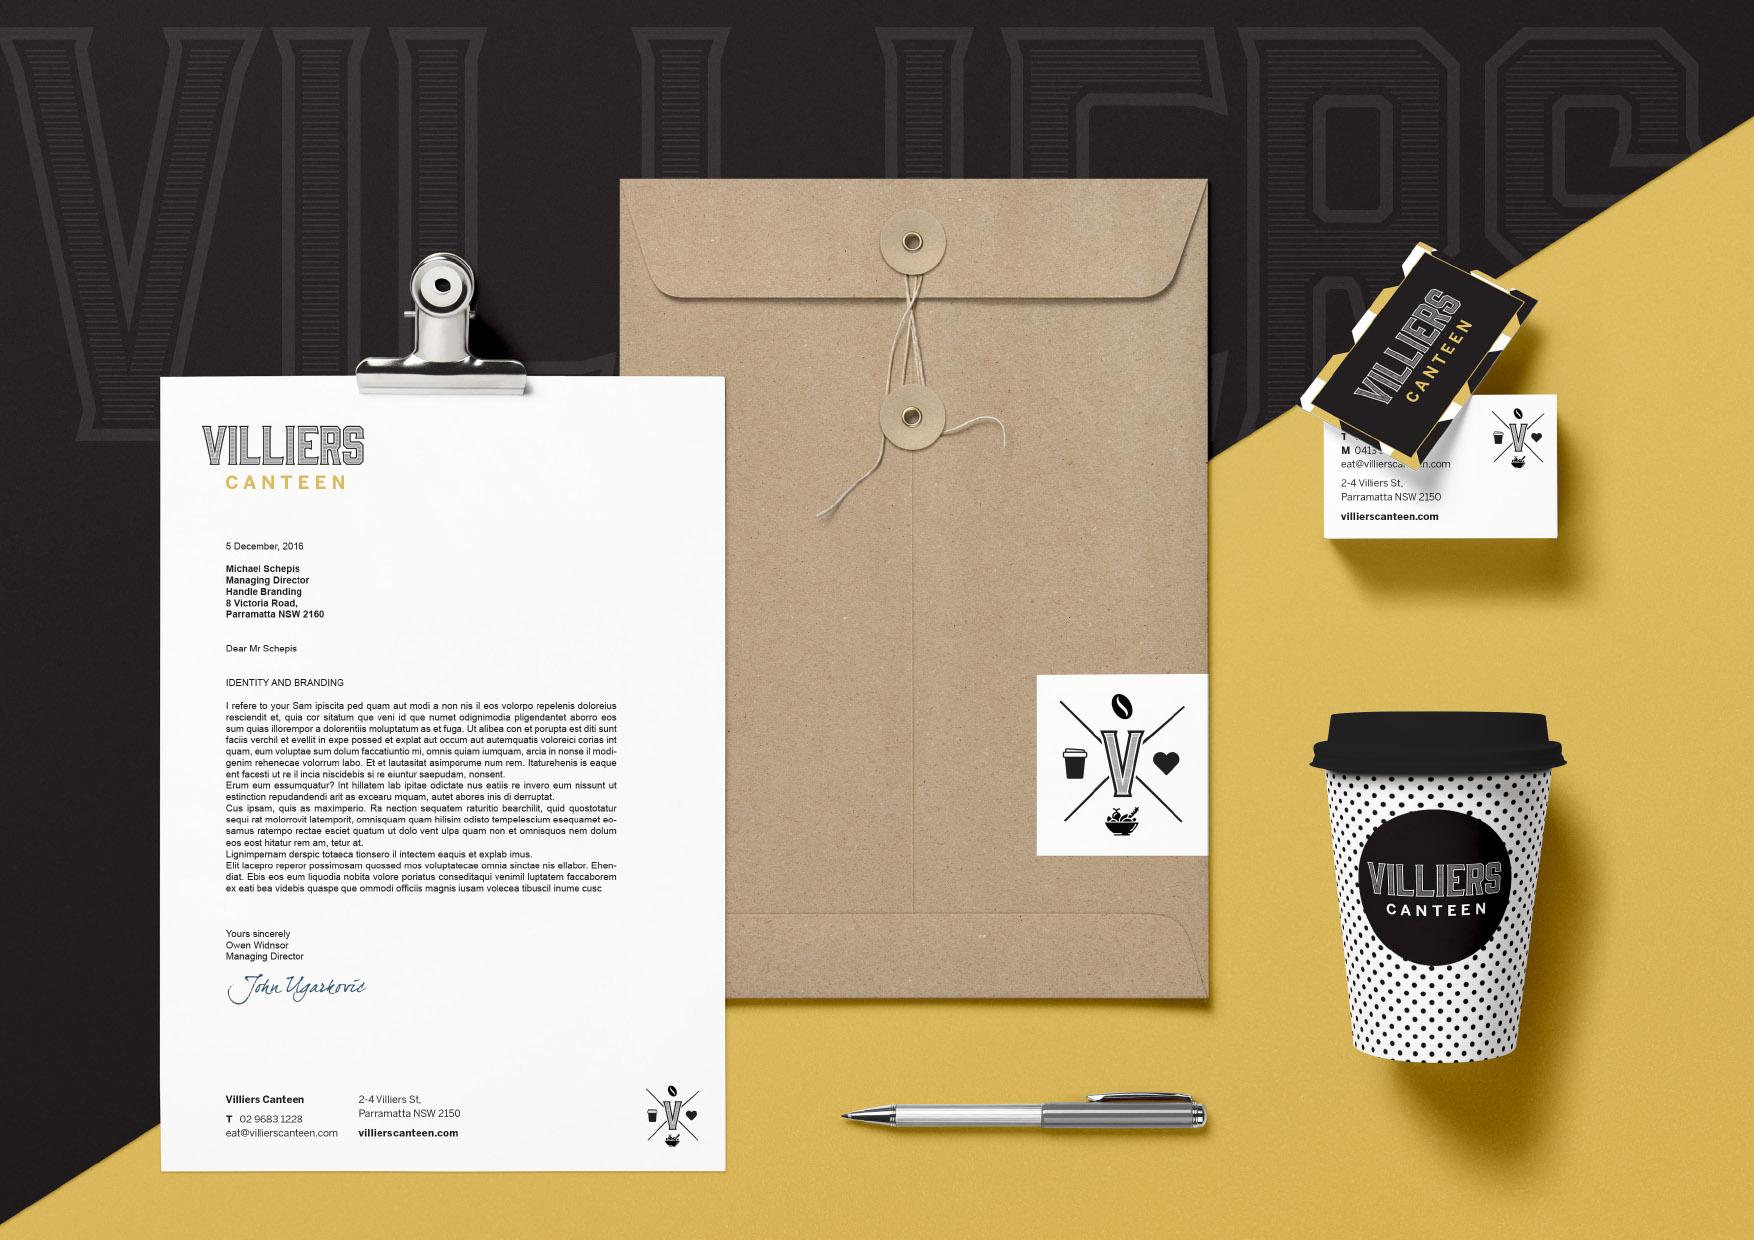 Handle-Branding-Villiers-Street-Canteen-Rebranding_02_0007_Vector Smart Object.jpg